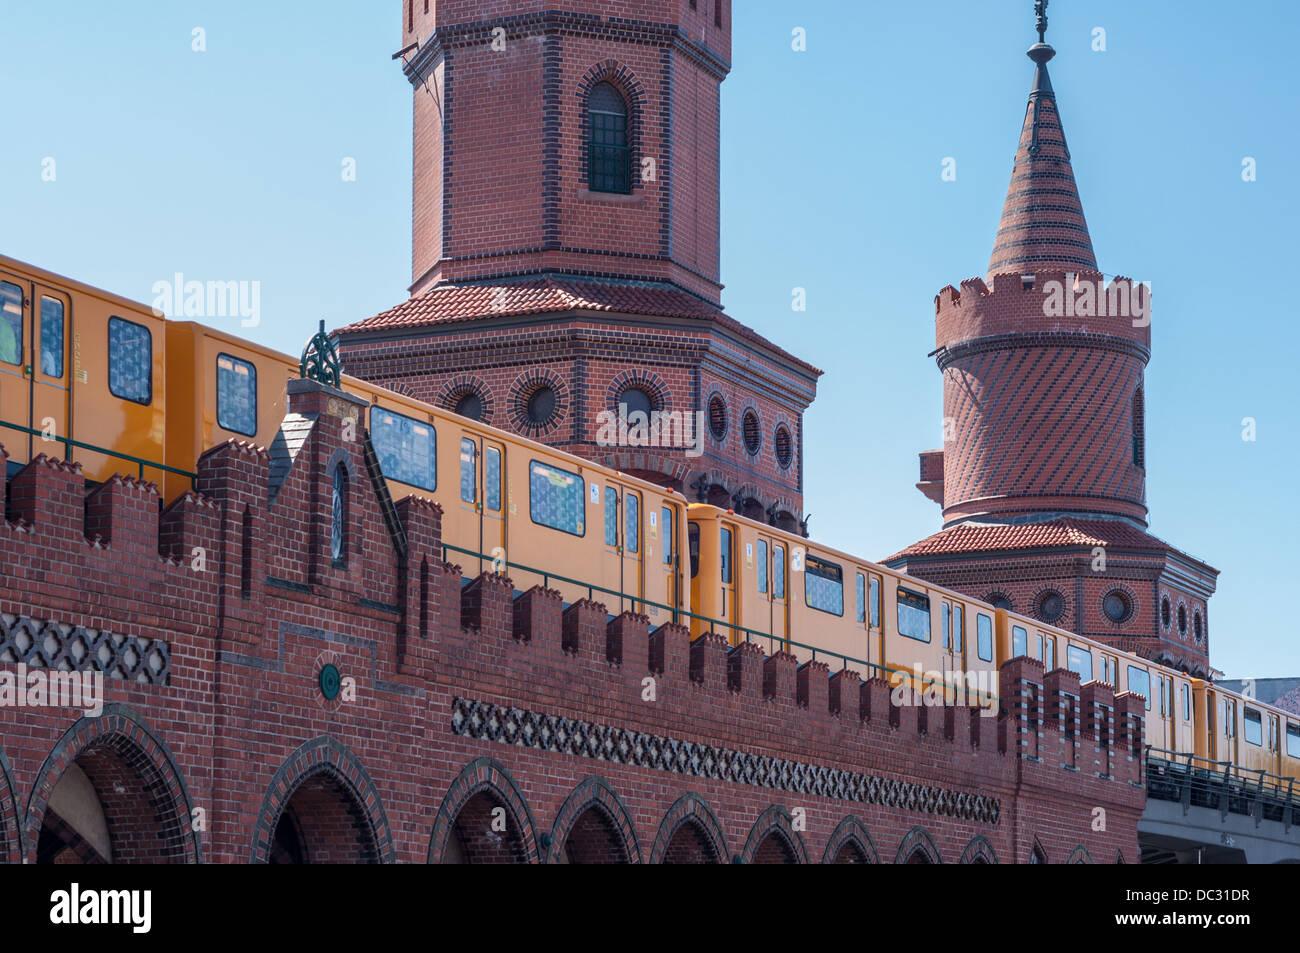 U-Bahn (subway) train traversing the Oberbaum Bruecke, Oberbaum Bridge, Berlin Germany. Stock Photo